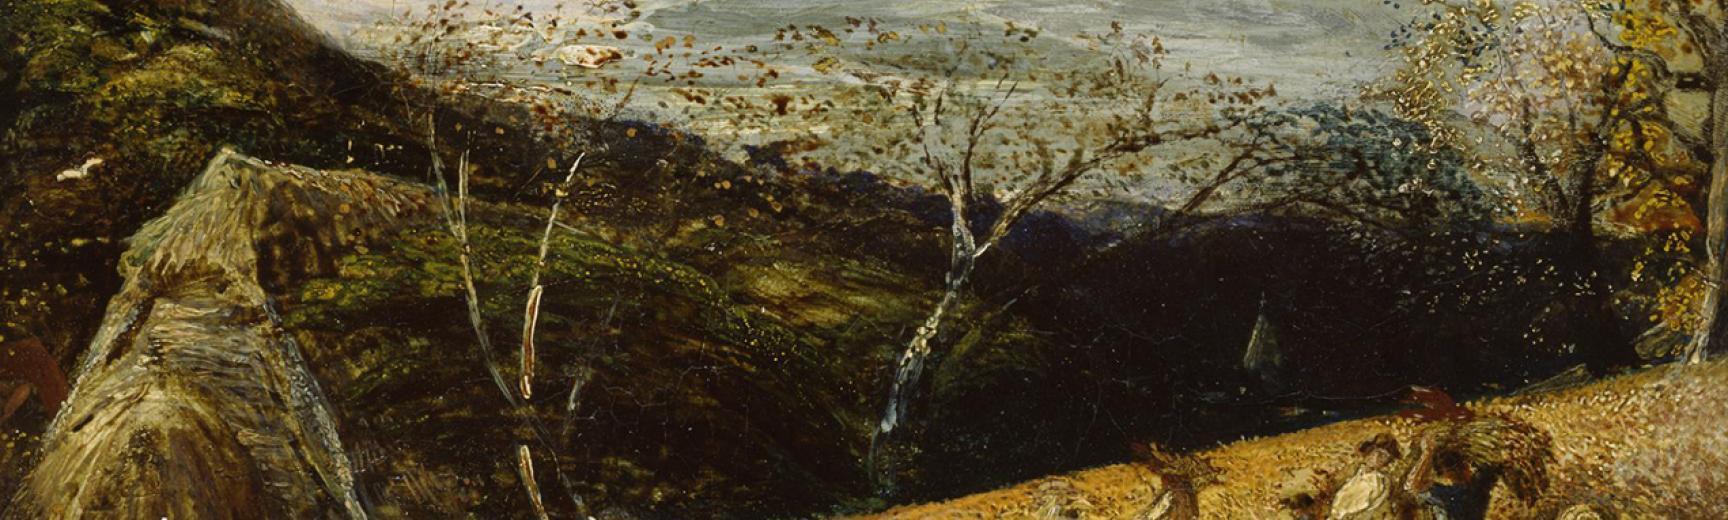 ashmolean 19th century art